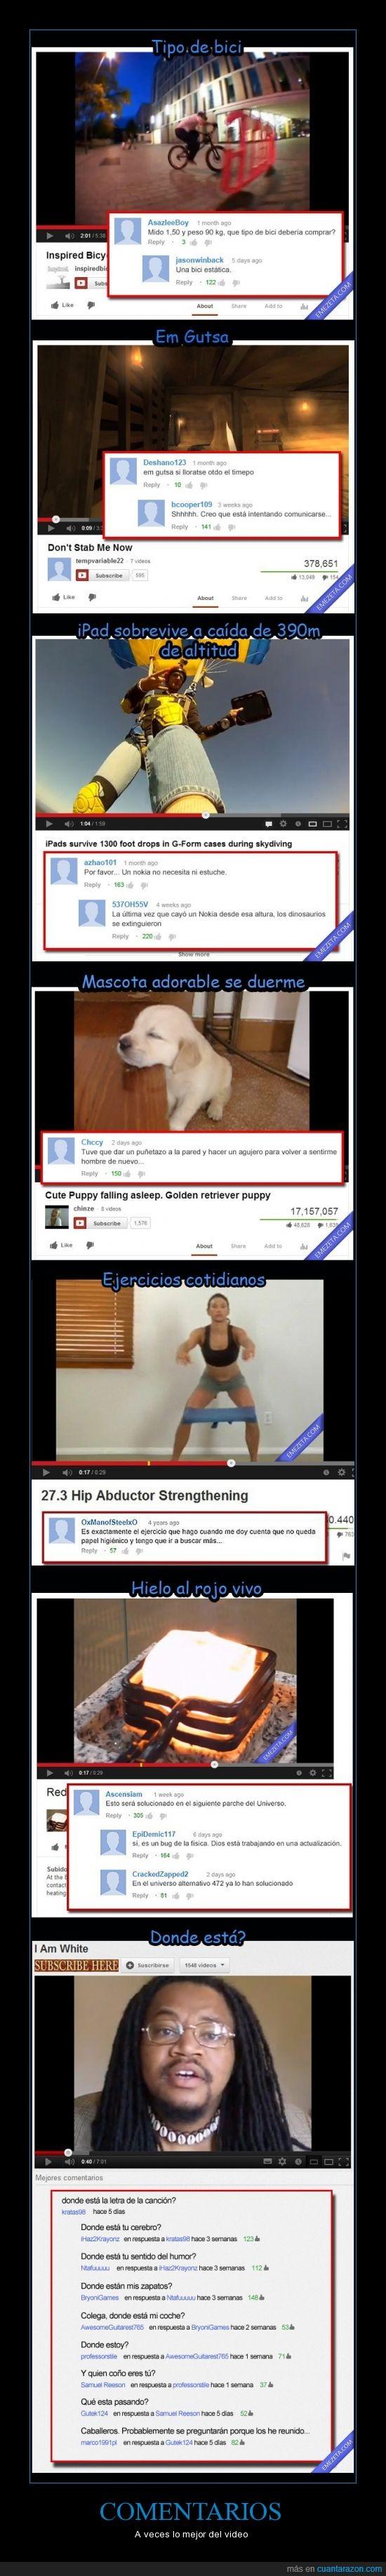 bici estatica,bug,comentarios,gordo,graciosos,perro,rojo,videos,youtube